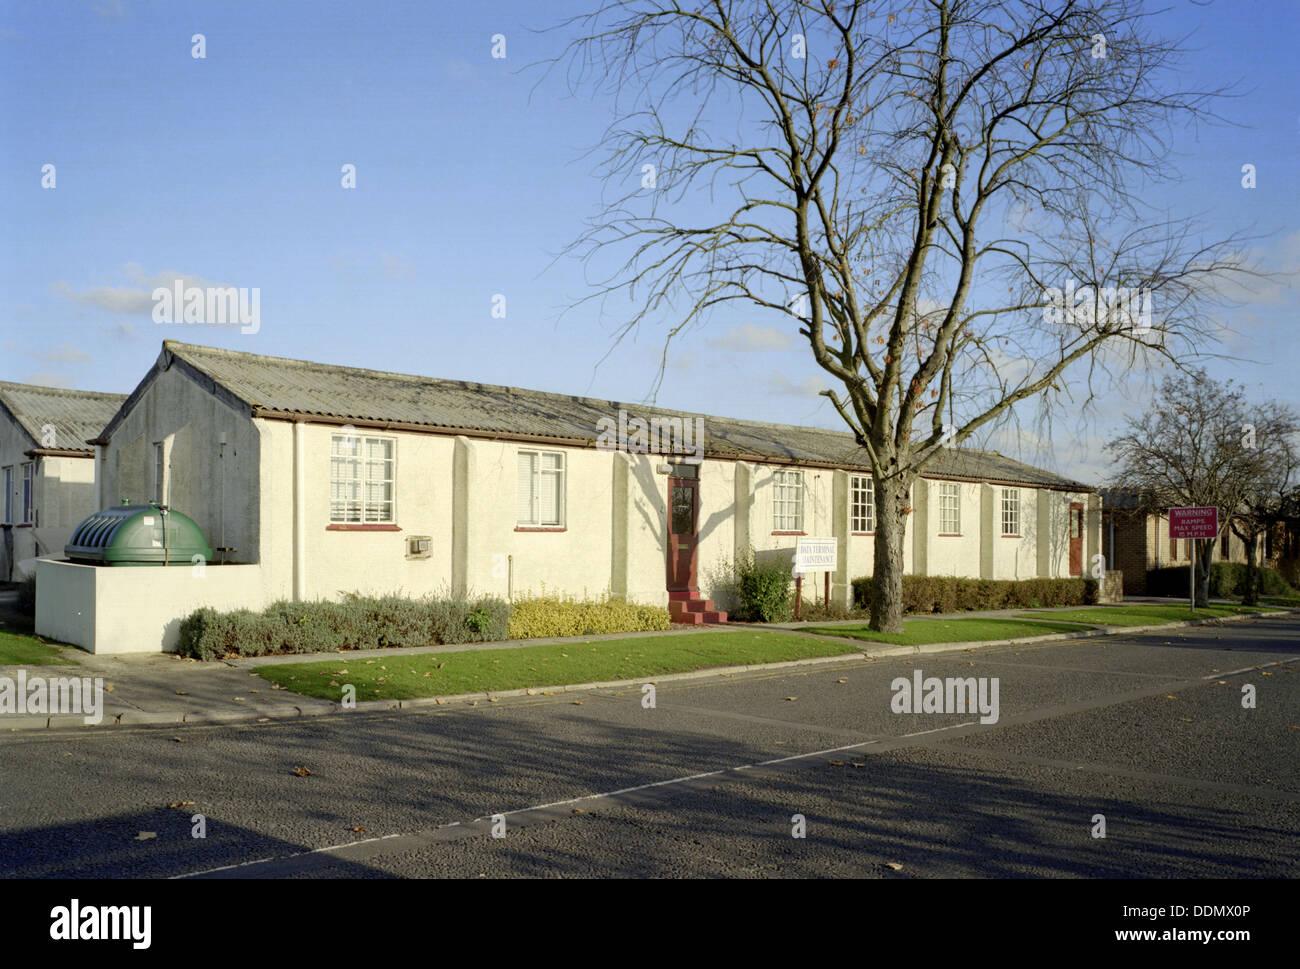 Calle principal cuartel de Greenham Common base aérea cerca de Newbury, Berkshire, 1999. Artista: M Hesketh Roberts Imagen De Stock